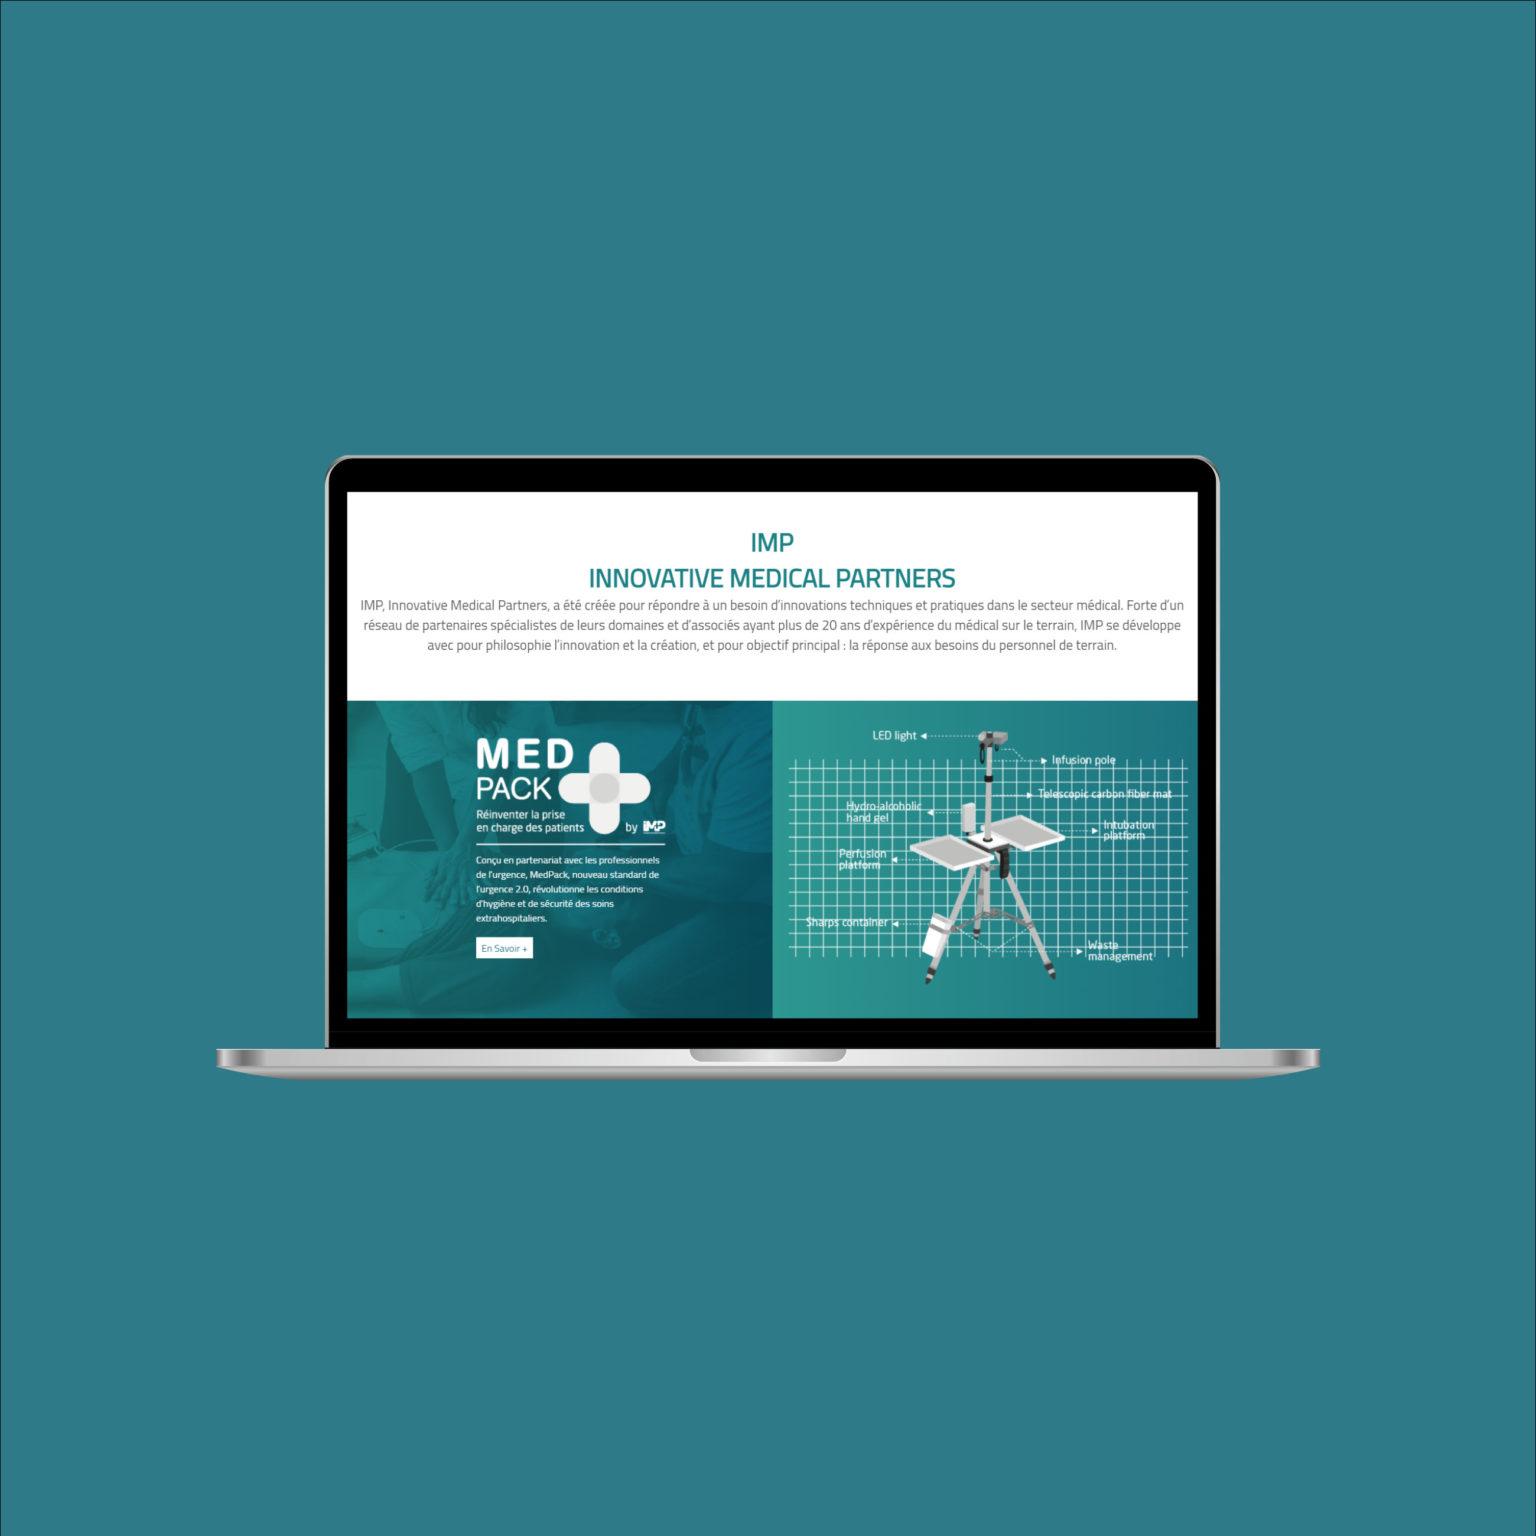 Miko Digital Agence Web à Liège - IMP France